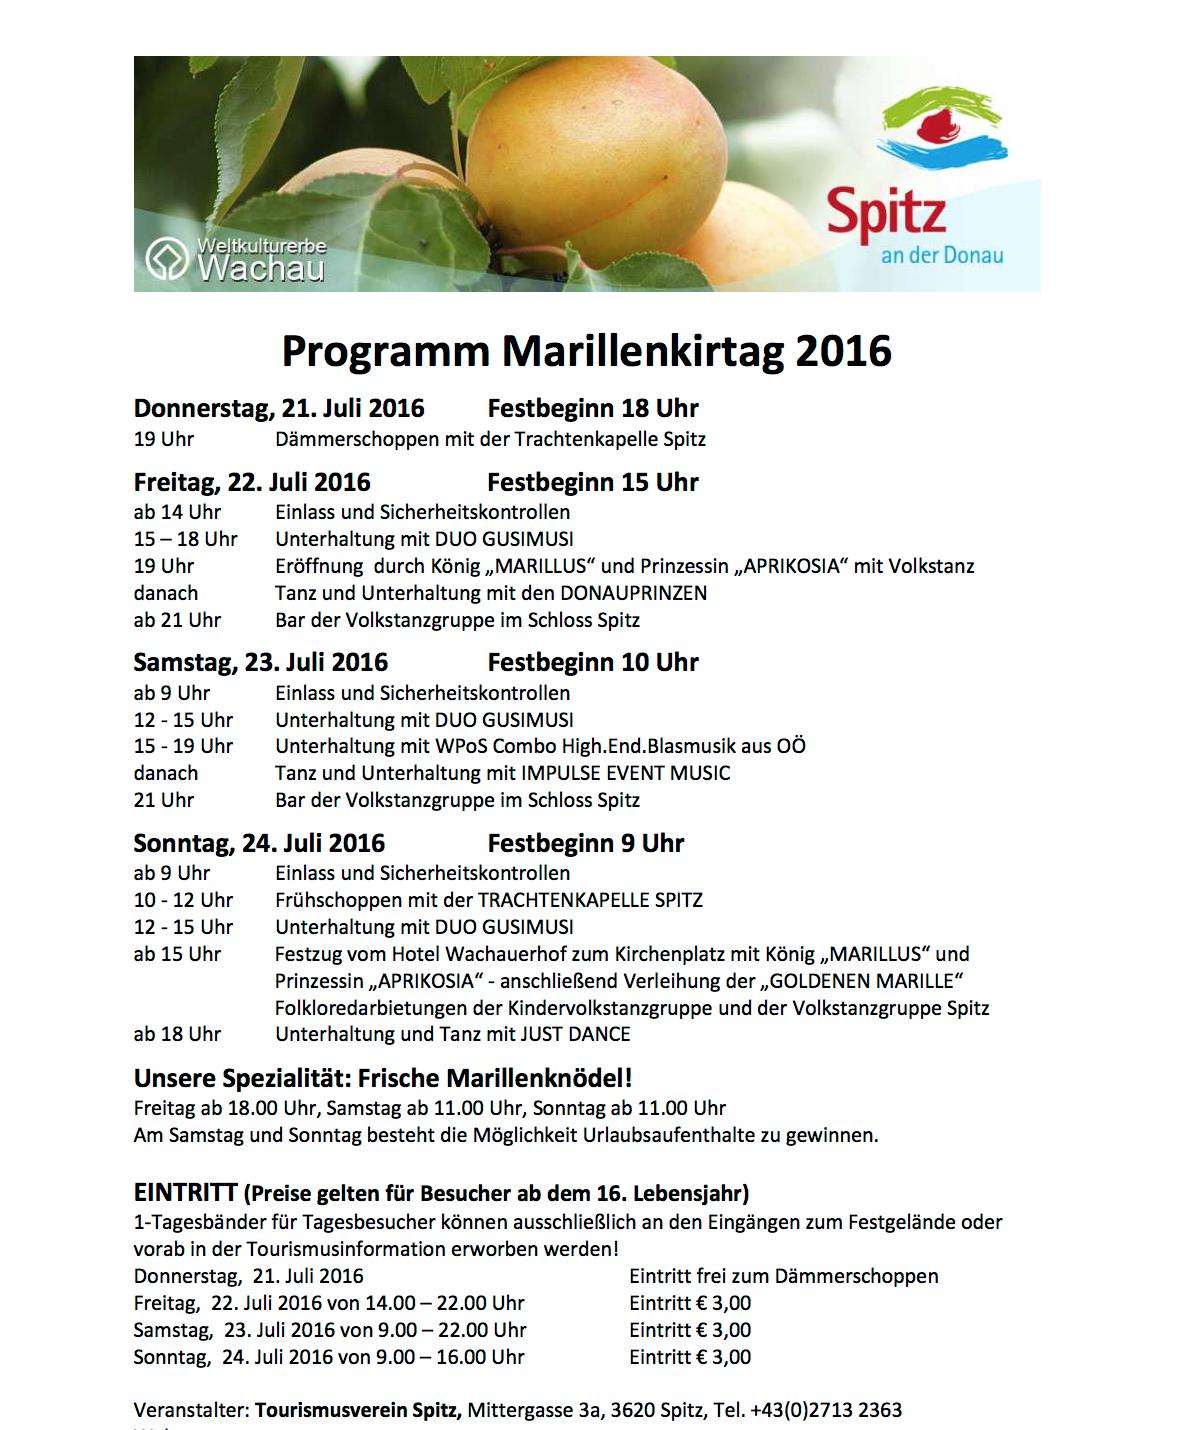 Programm Marillenkirtag 2016